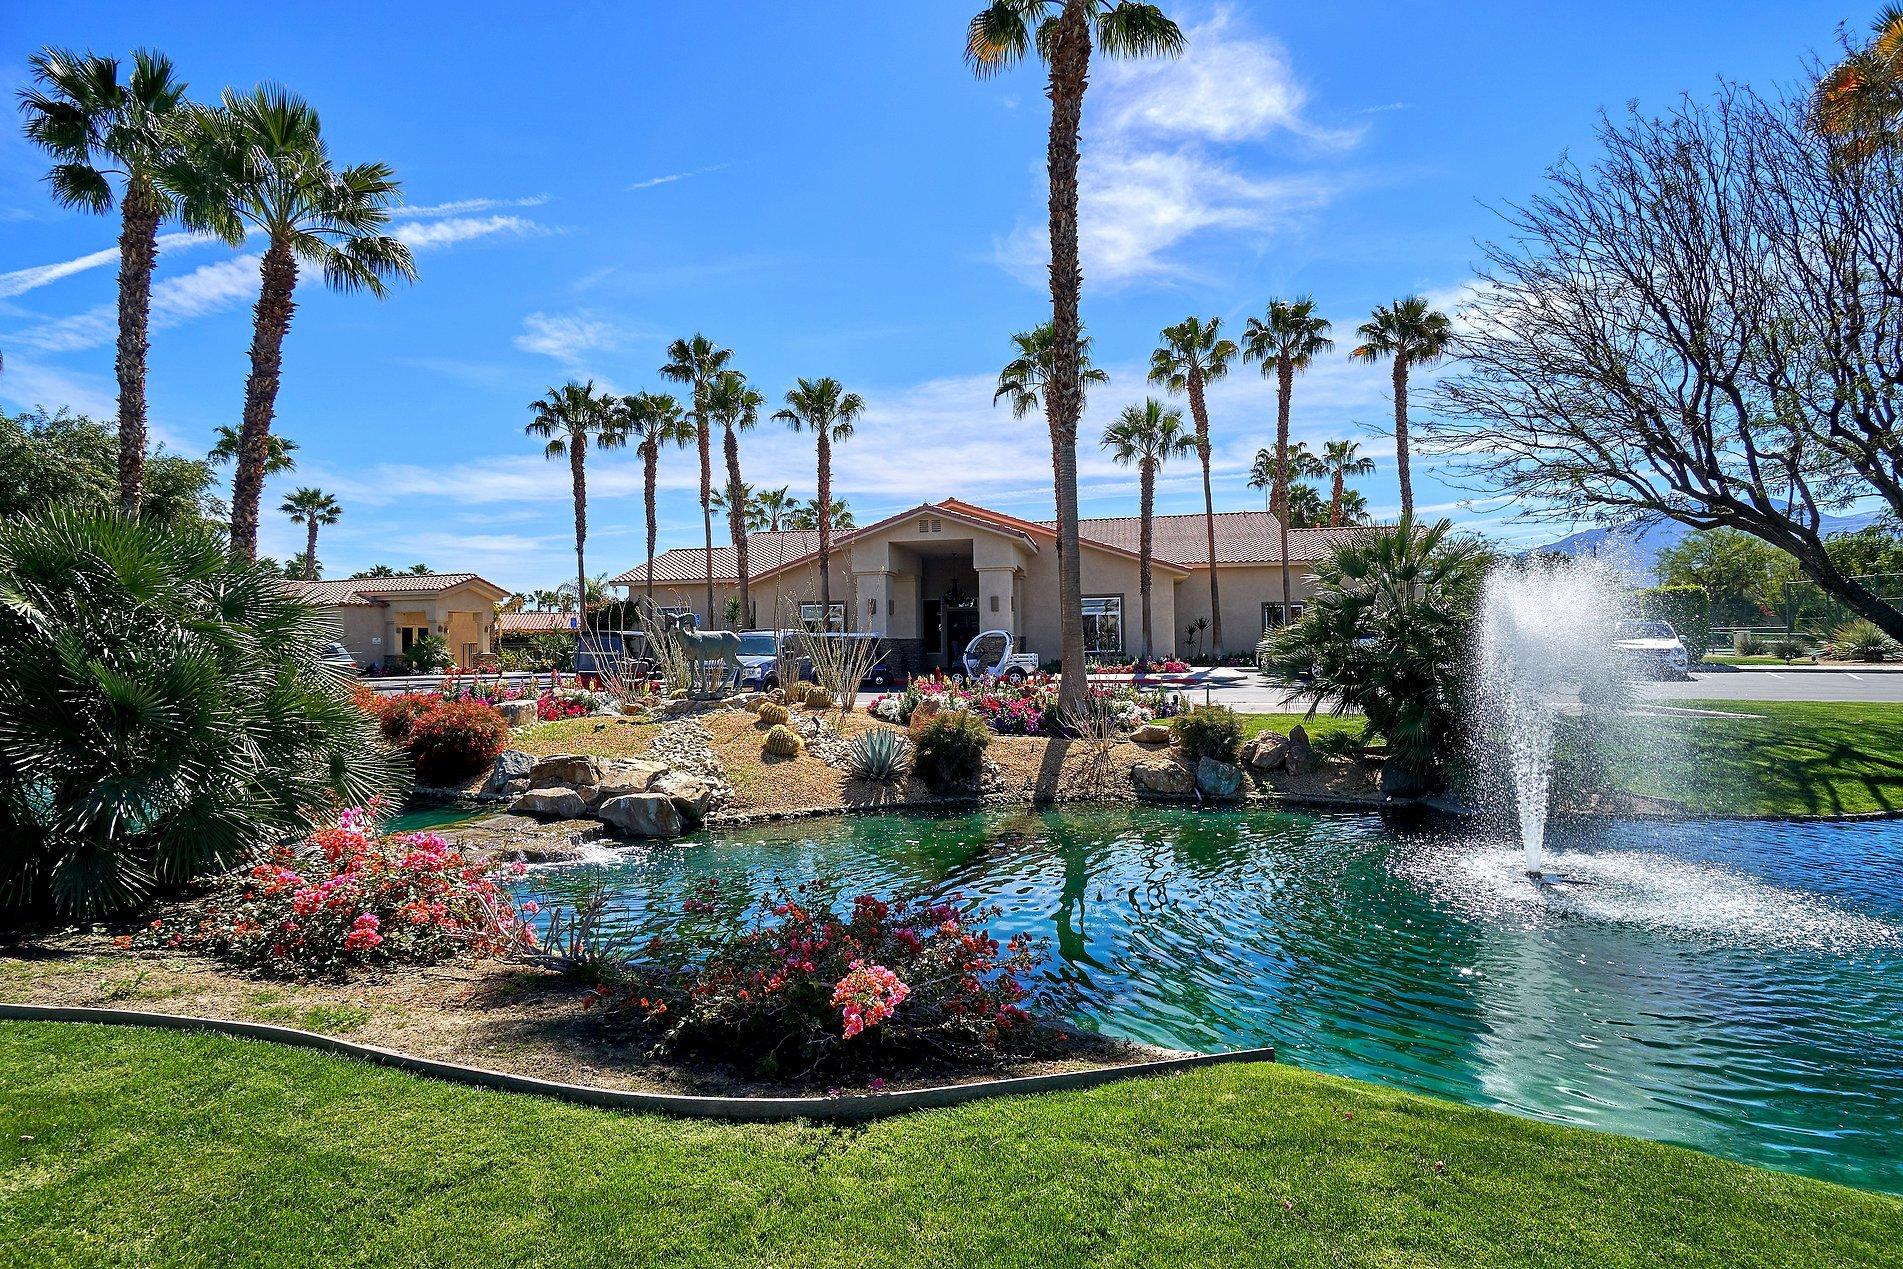 Rv Park Rental Agreement Elegant Luxury Rv Park Indio Ca